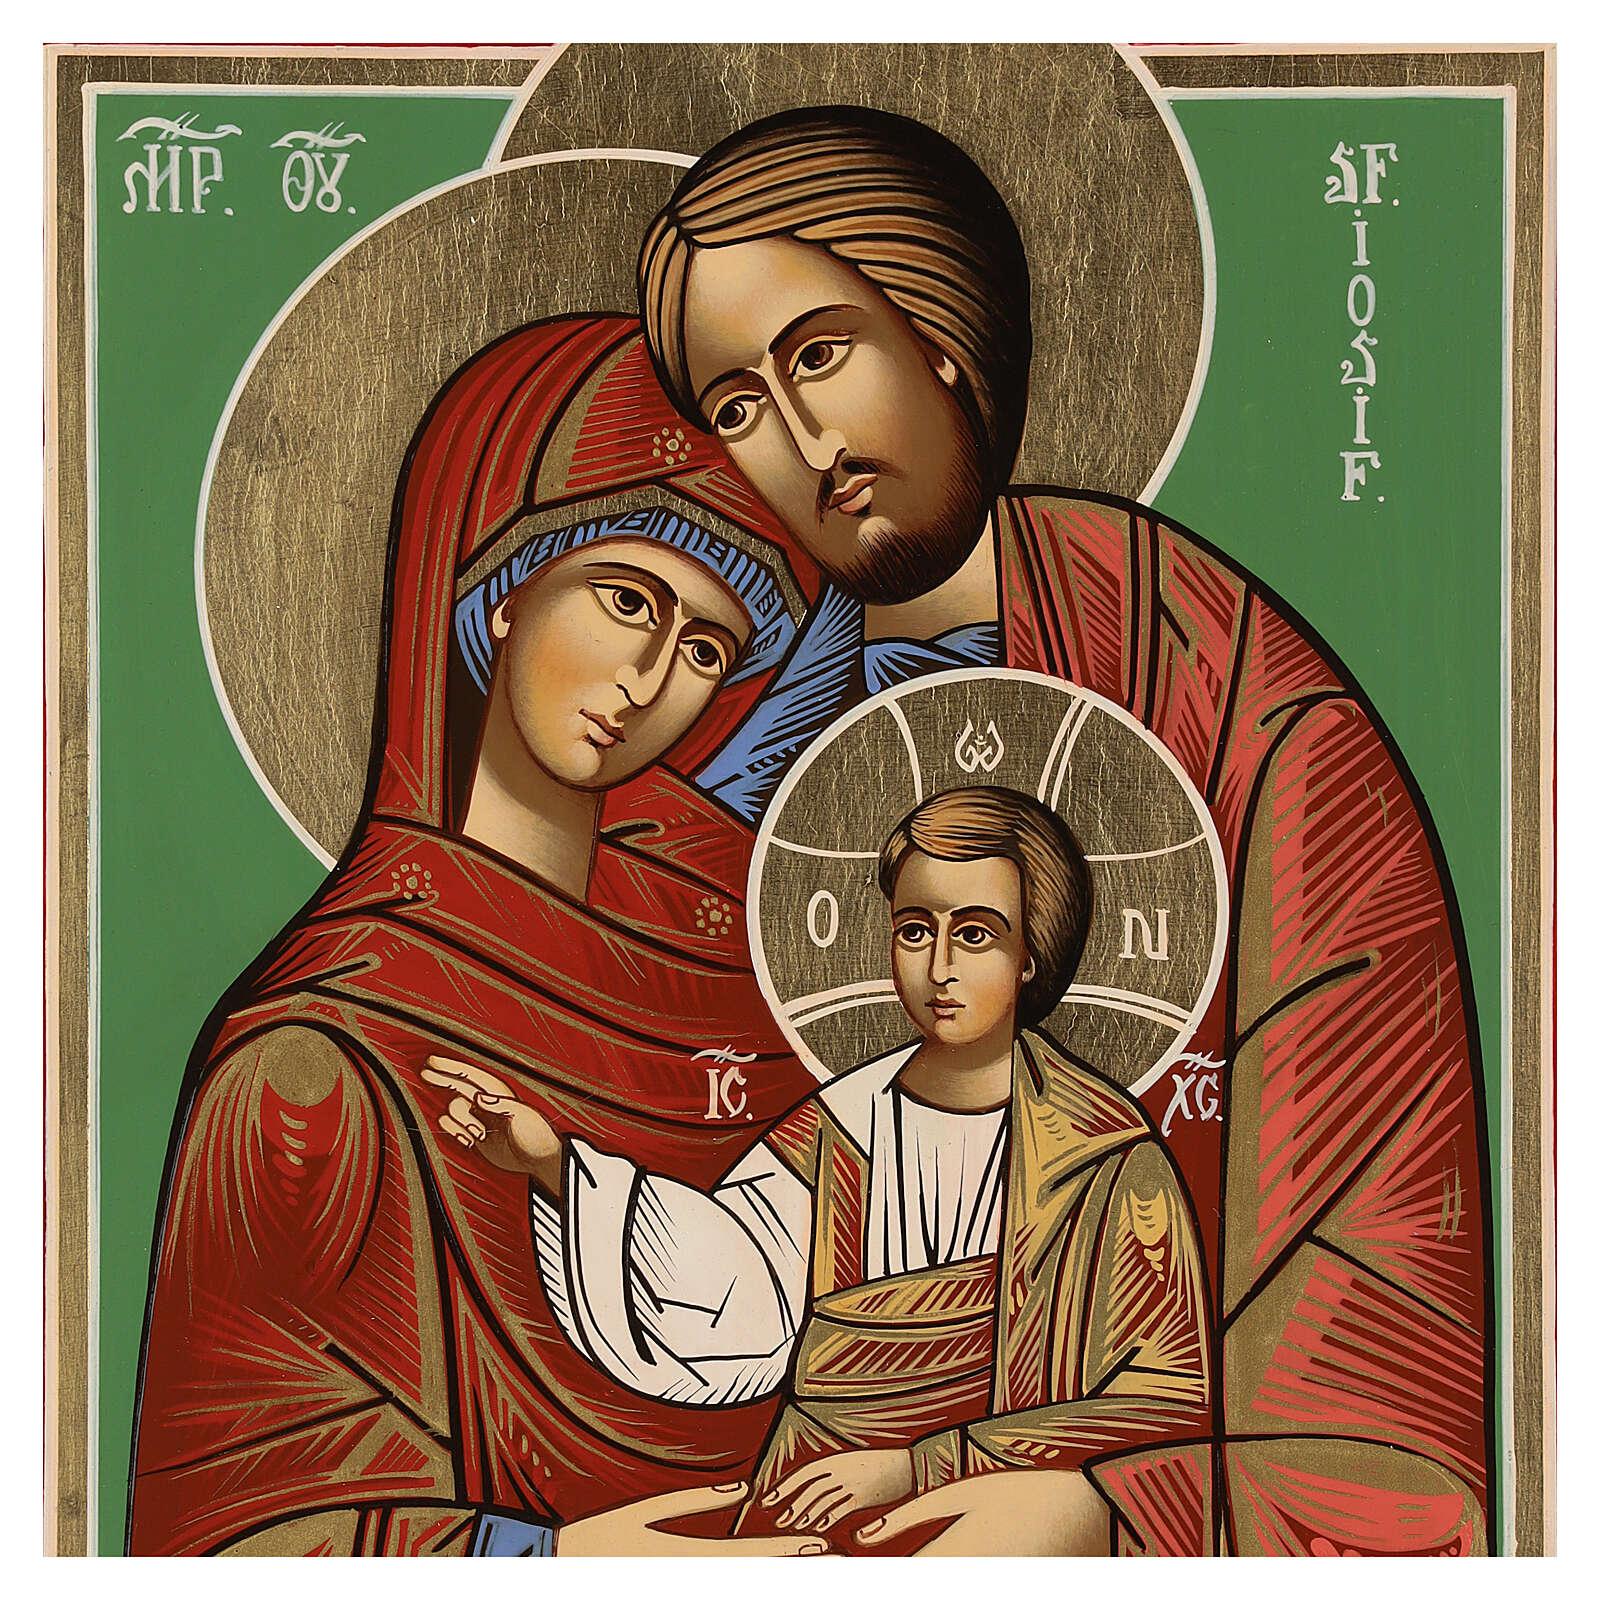 Icono Rumanía Sagrada Familia 32x28 cm pintado estilo ruso 4